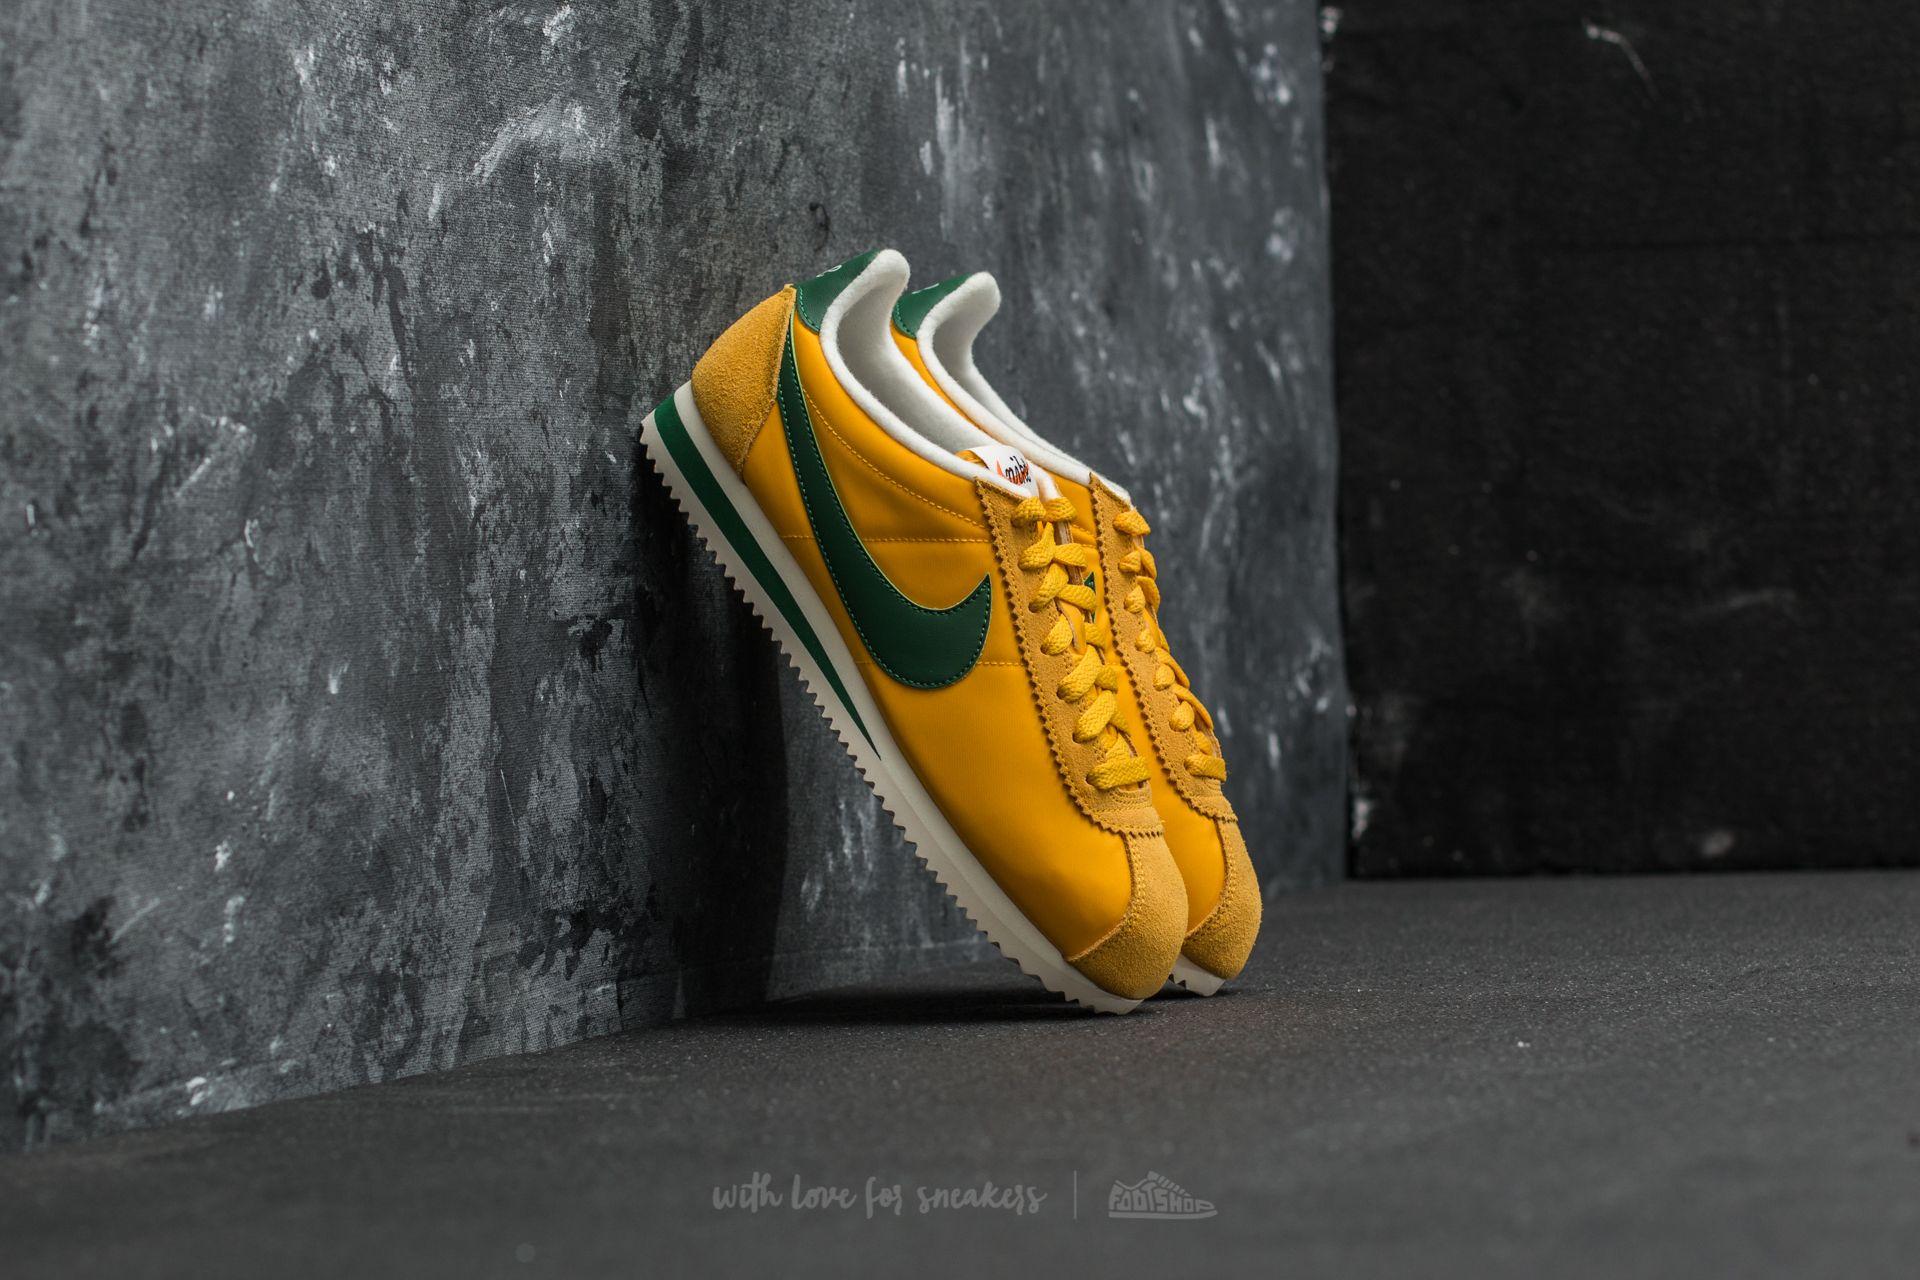 new style 10cd2 1383c Nike Classic Cortez Nylon Premium. Yellow Ochre  Gorge Green-Sail